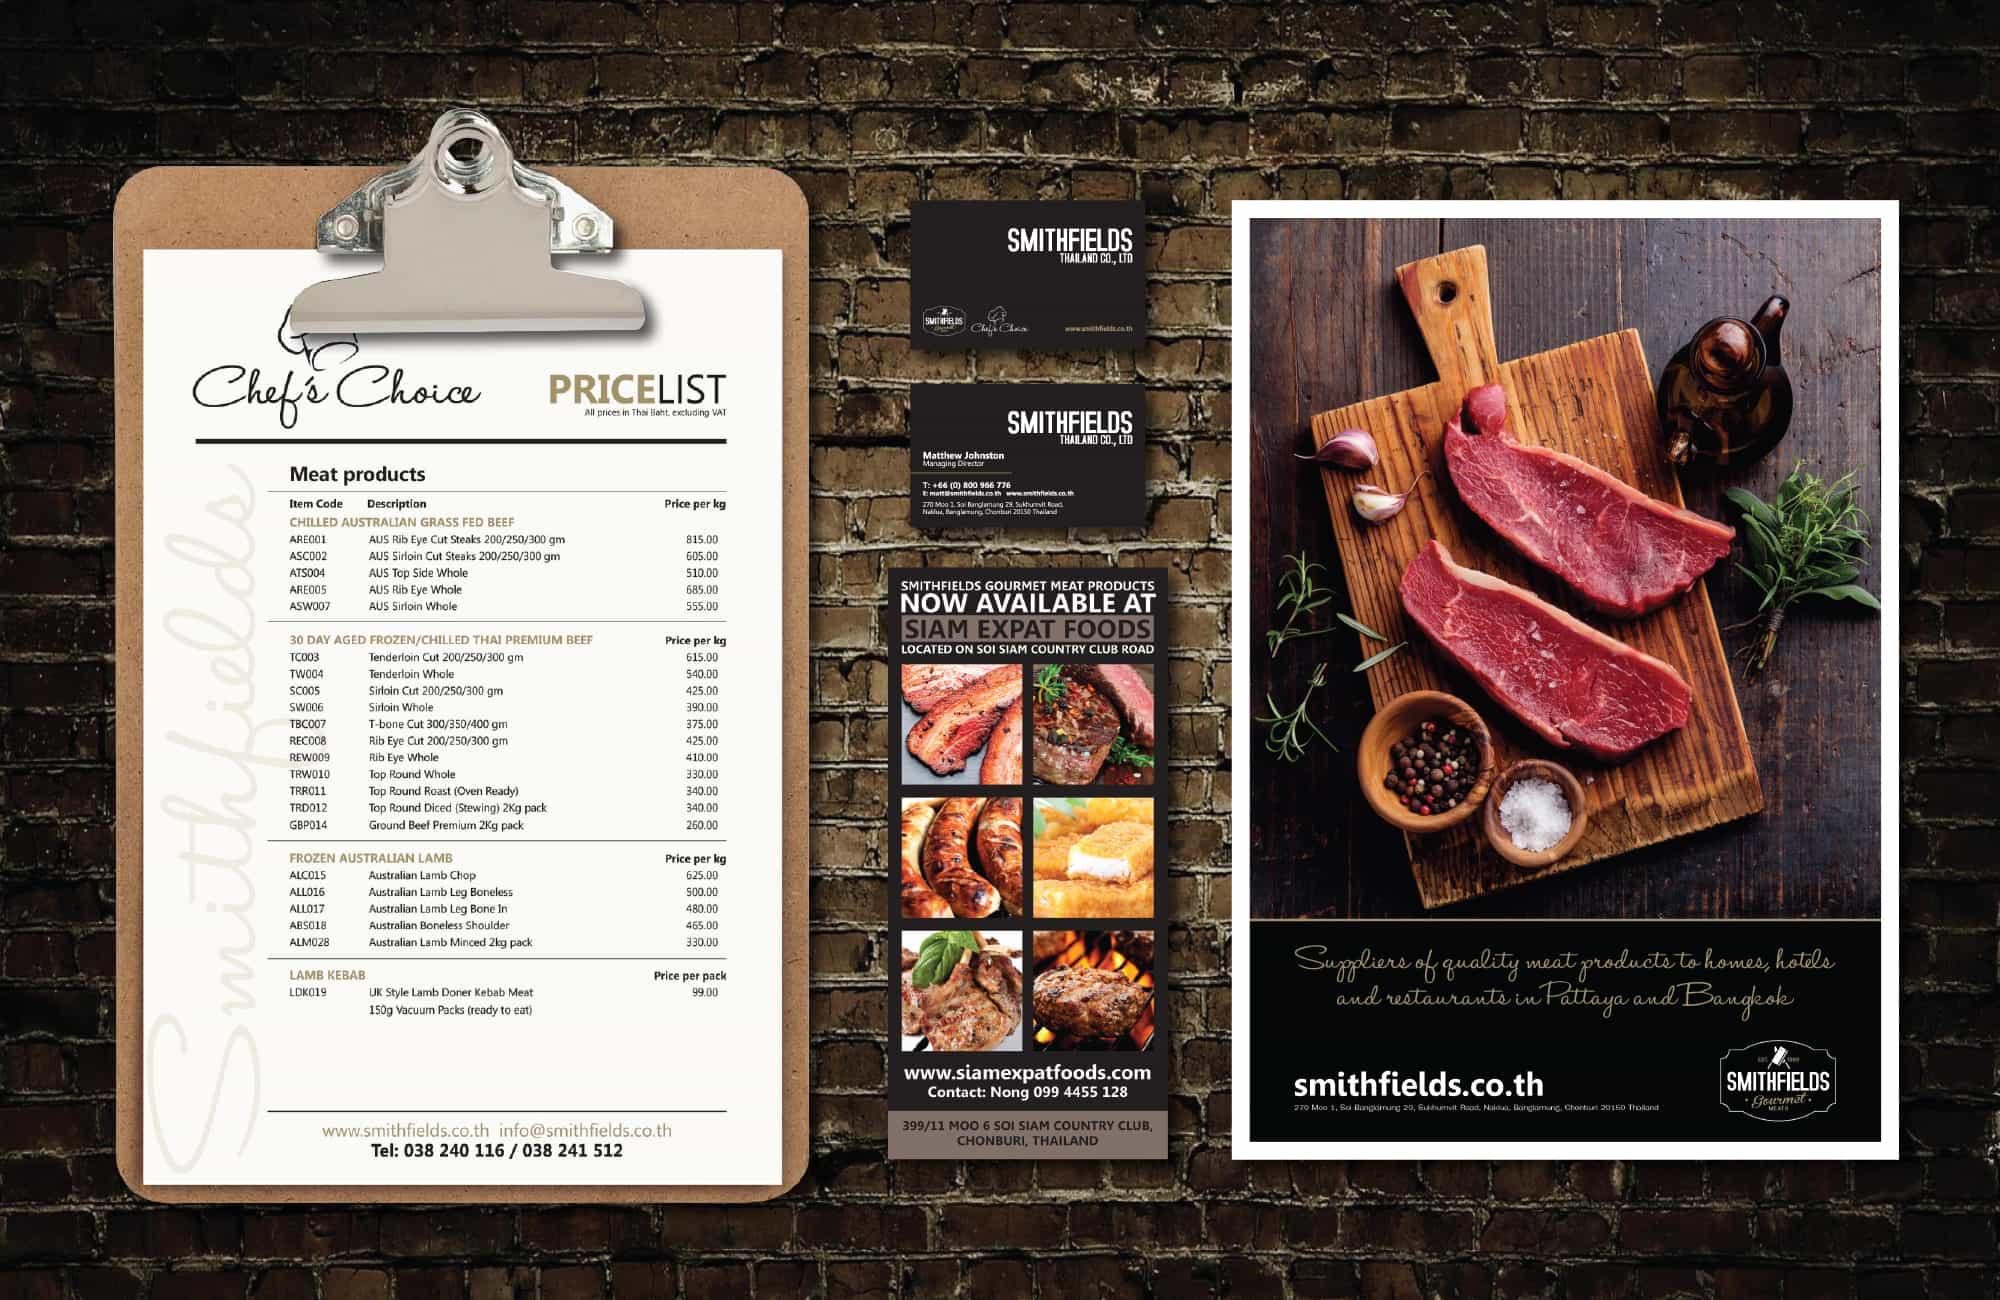 Smithfields Gourmet Meats